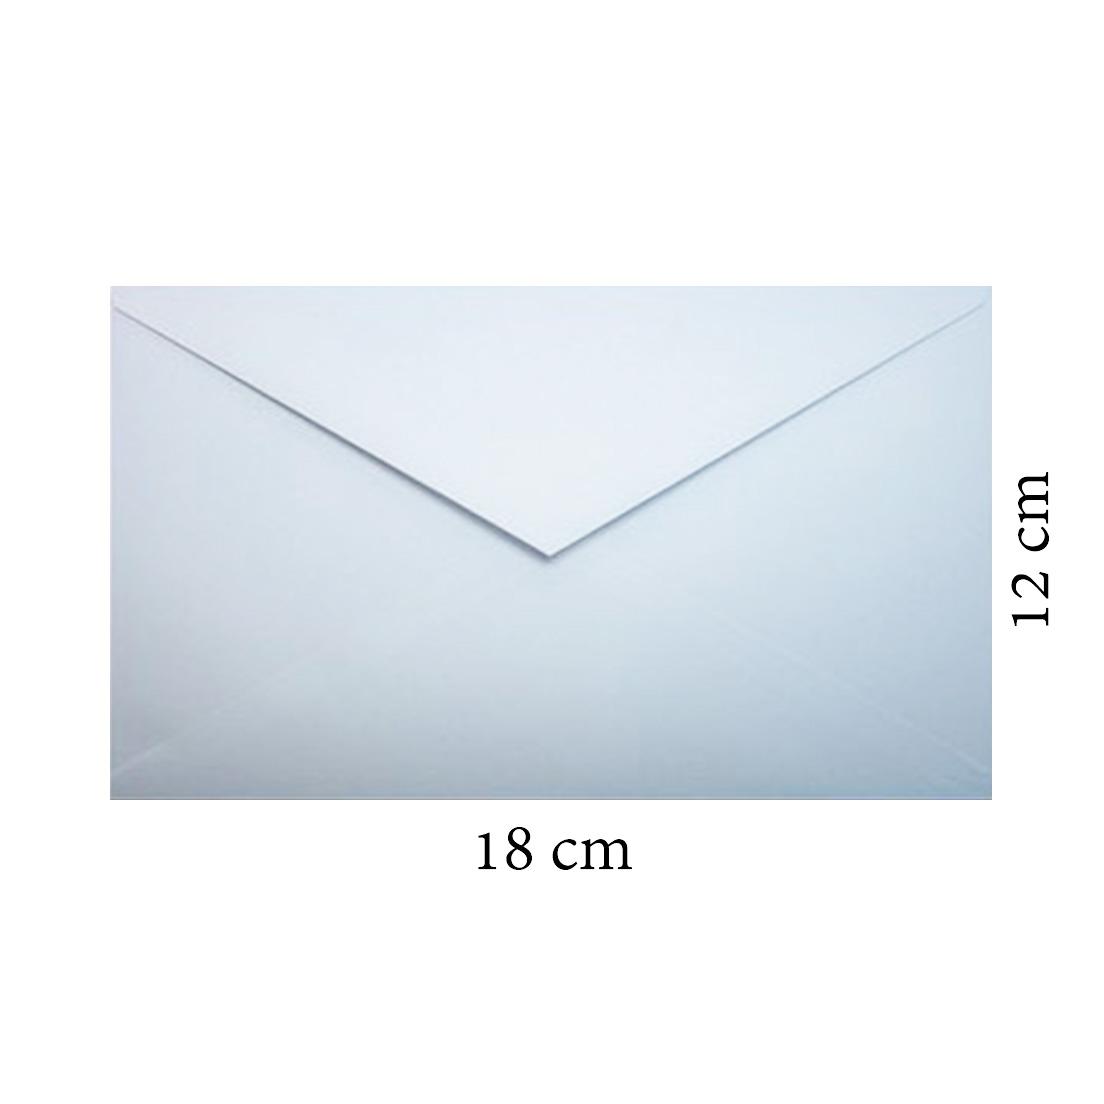 BUSTA LETTERA 12x18cm 70g SENZA FINESTRA 500pz BIANCA - 0014